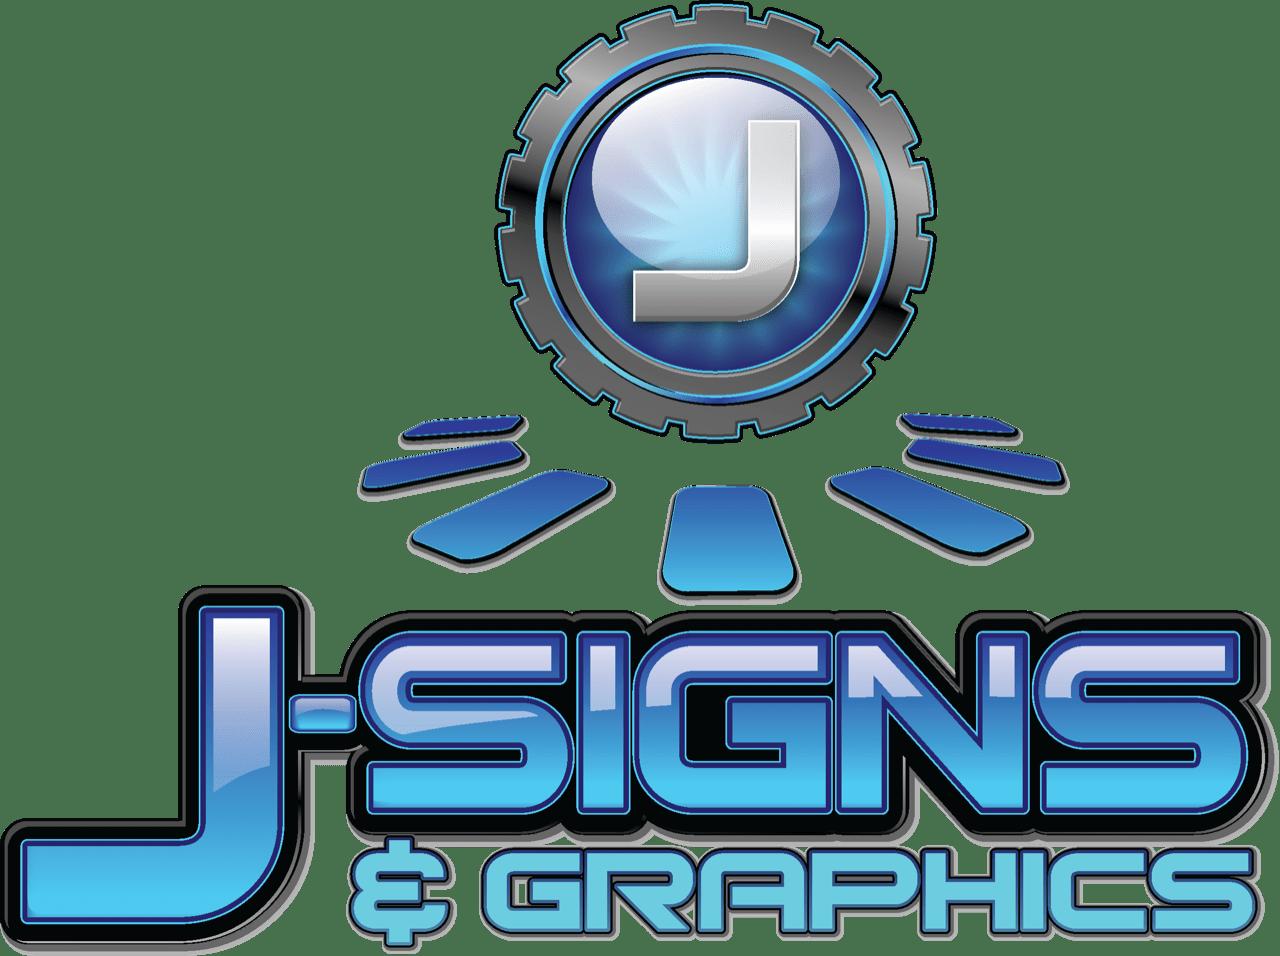 J-Signs